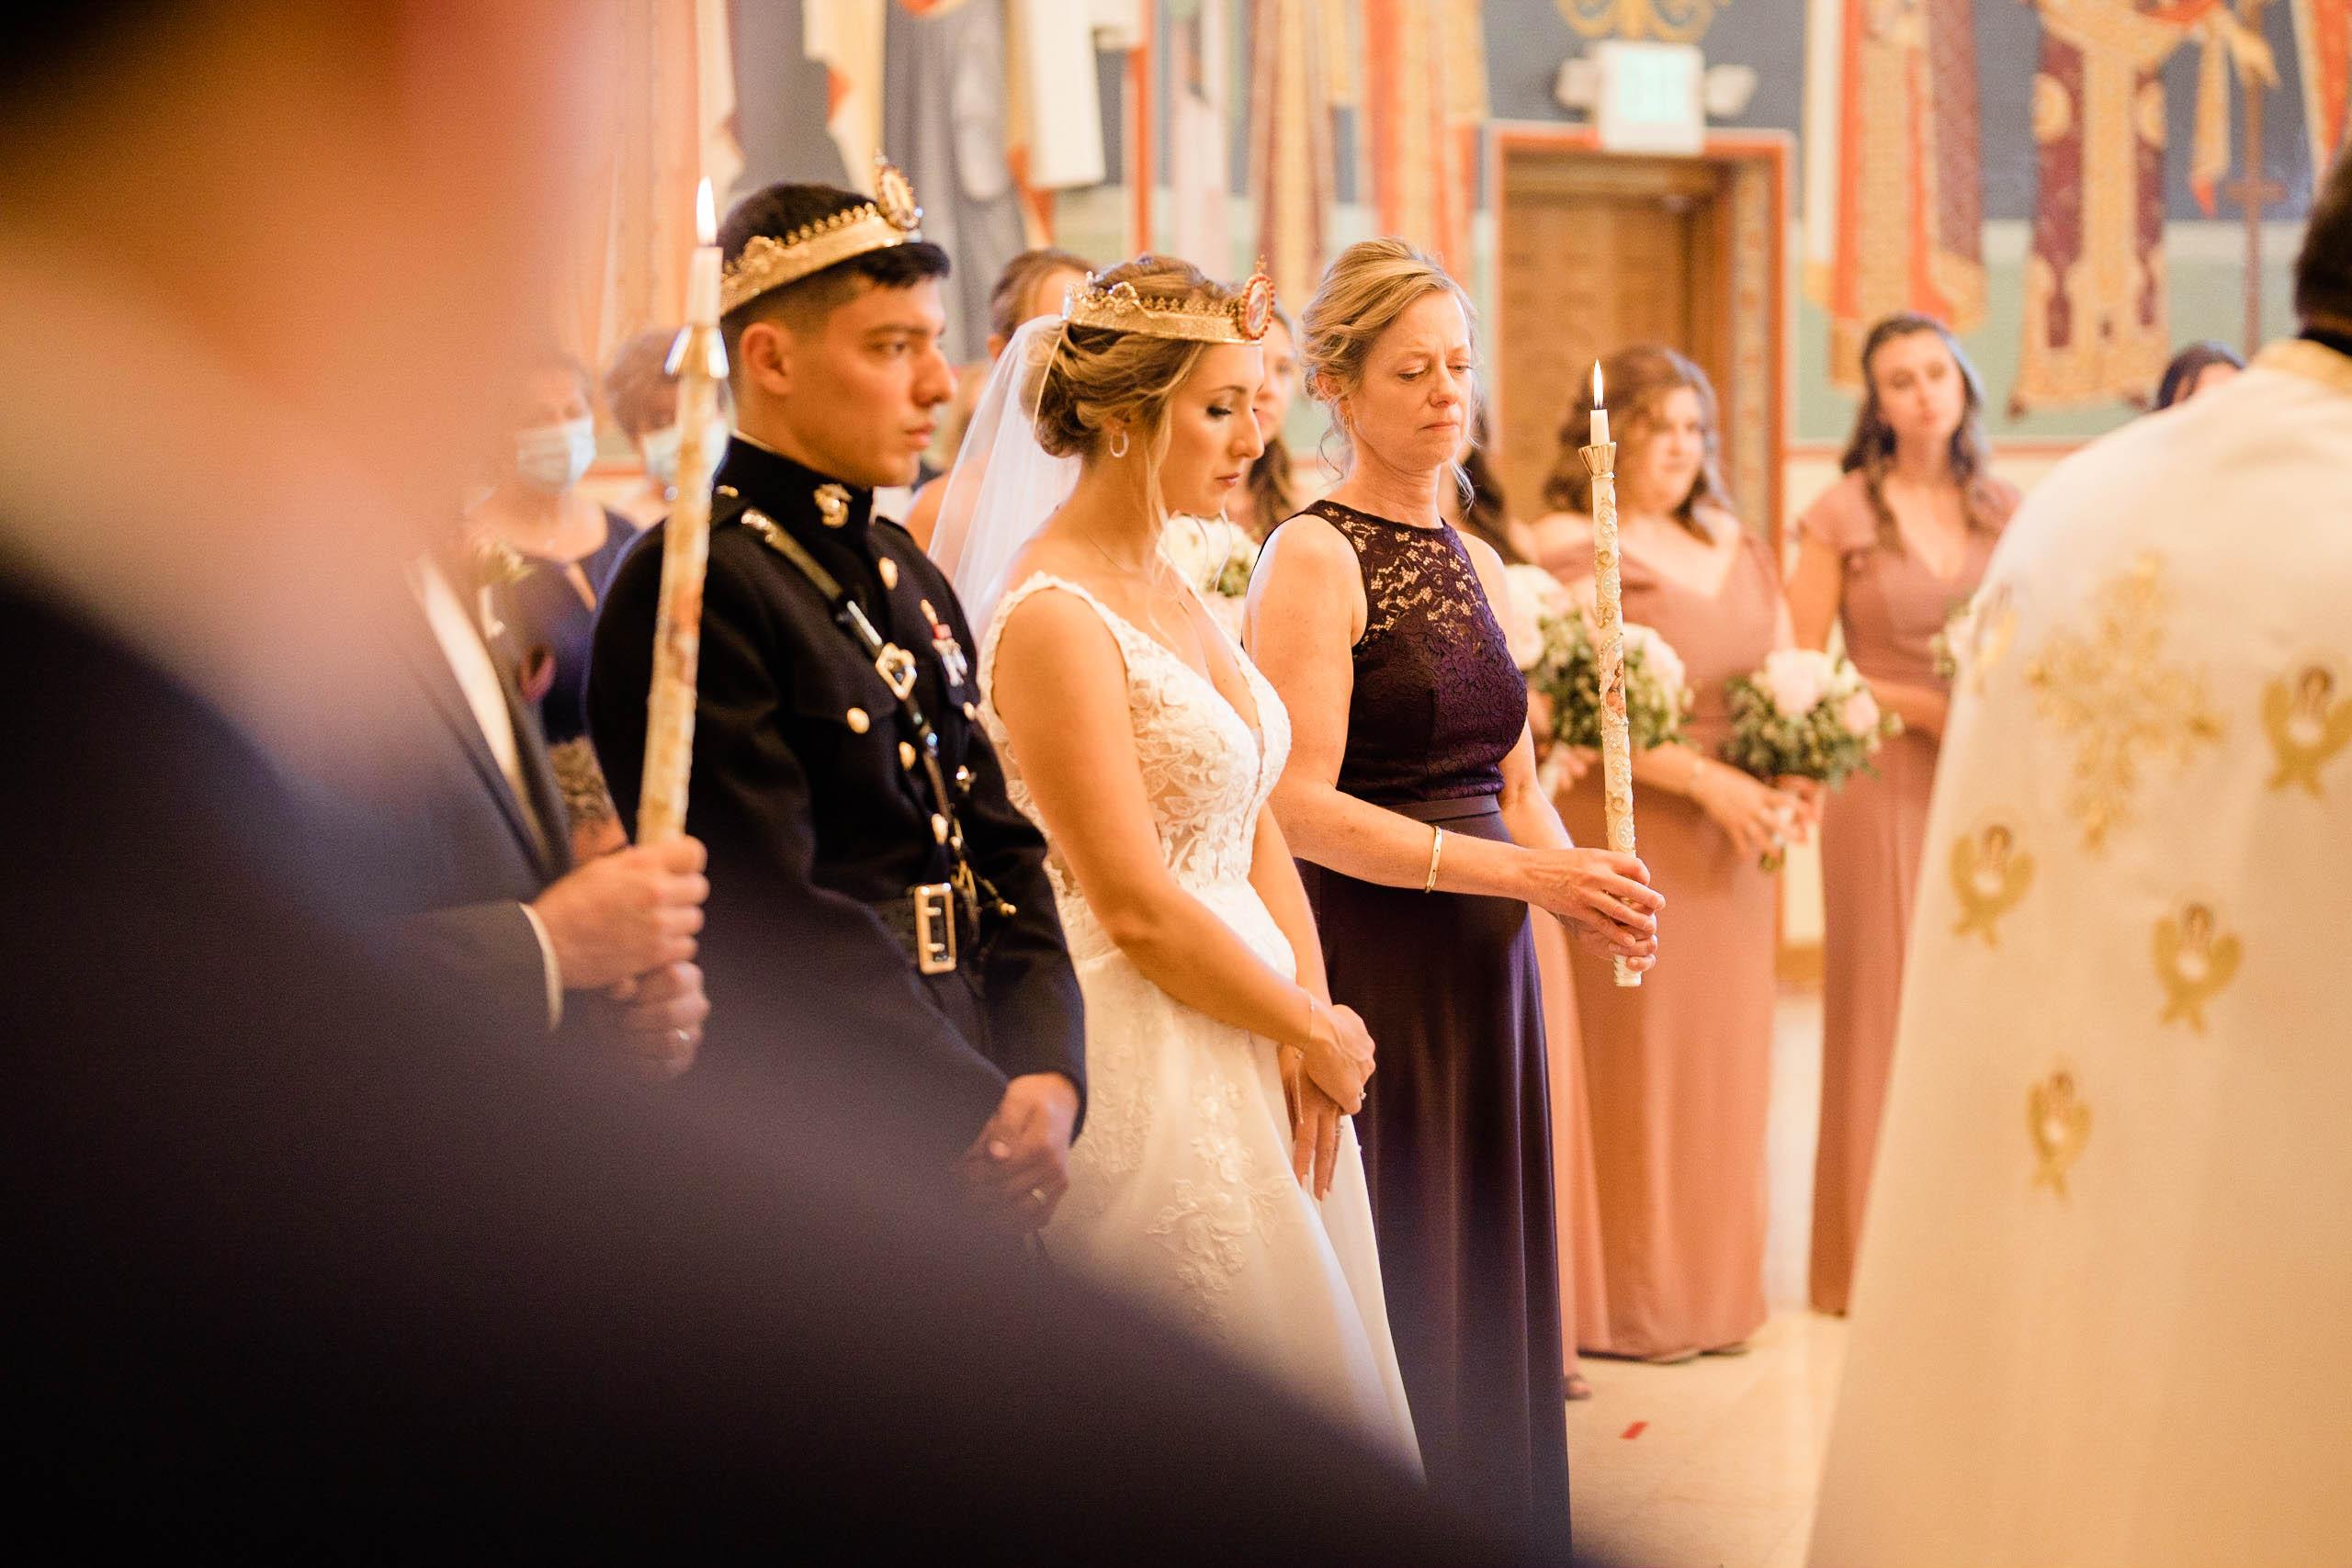 craven farm wedding at gorgeous Orthodox Church in Mountlake terrace